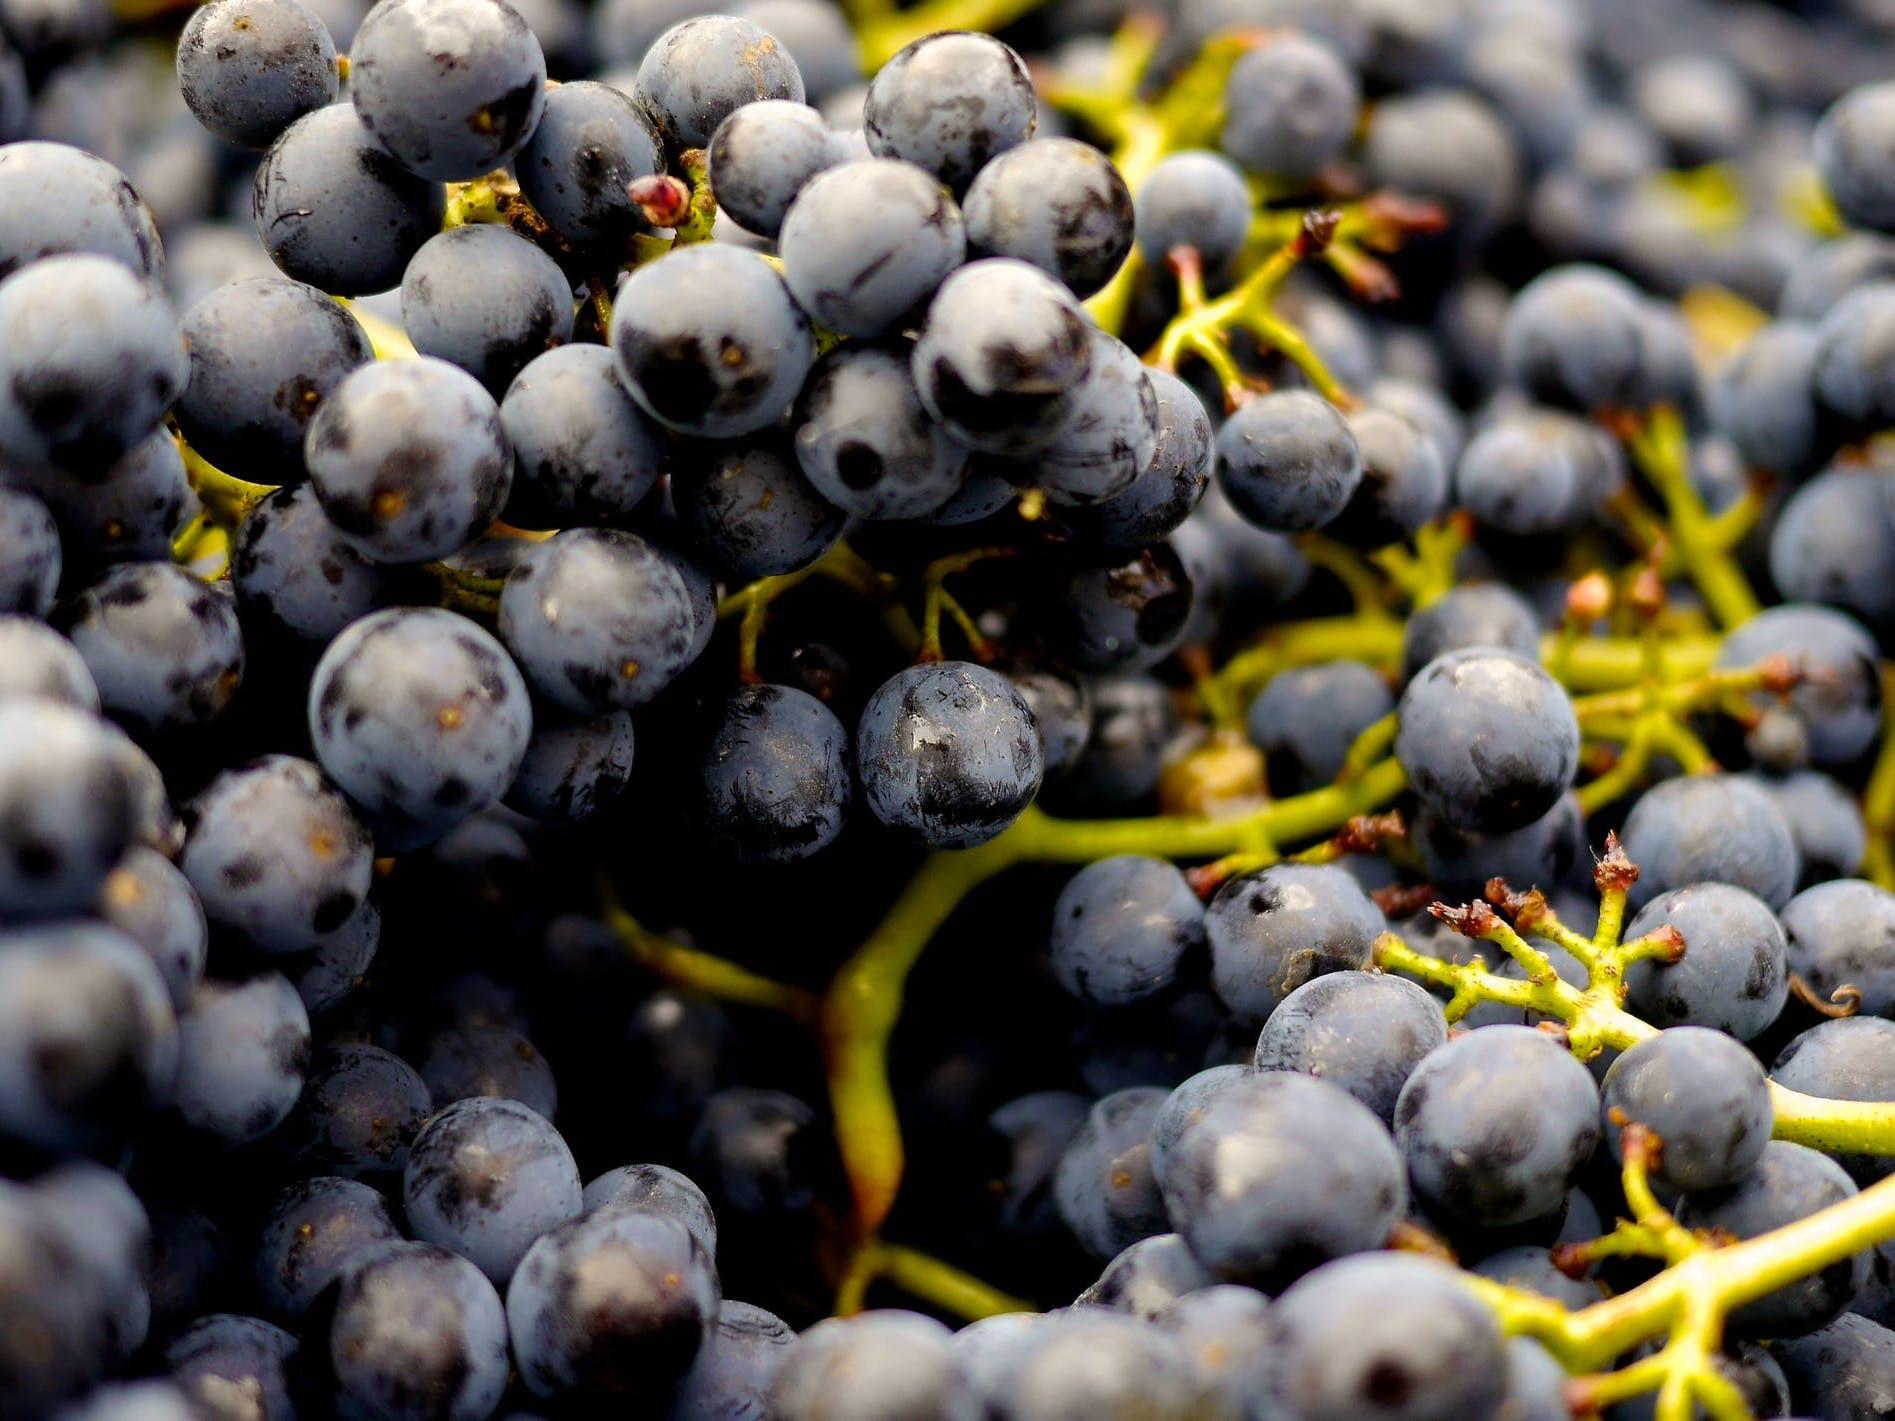 Museadine Black Grapes, 1lb